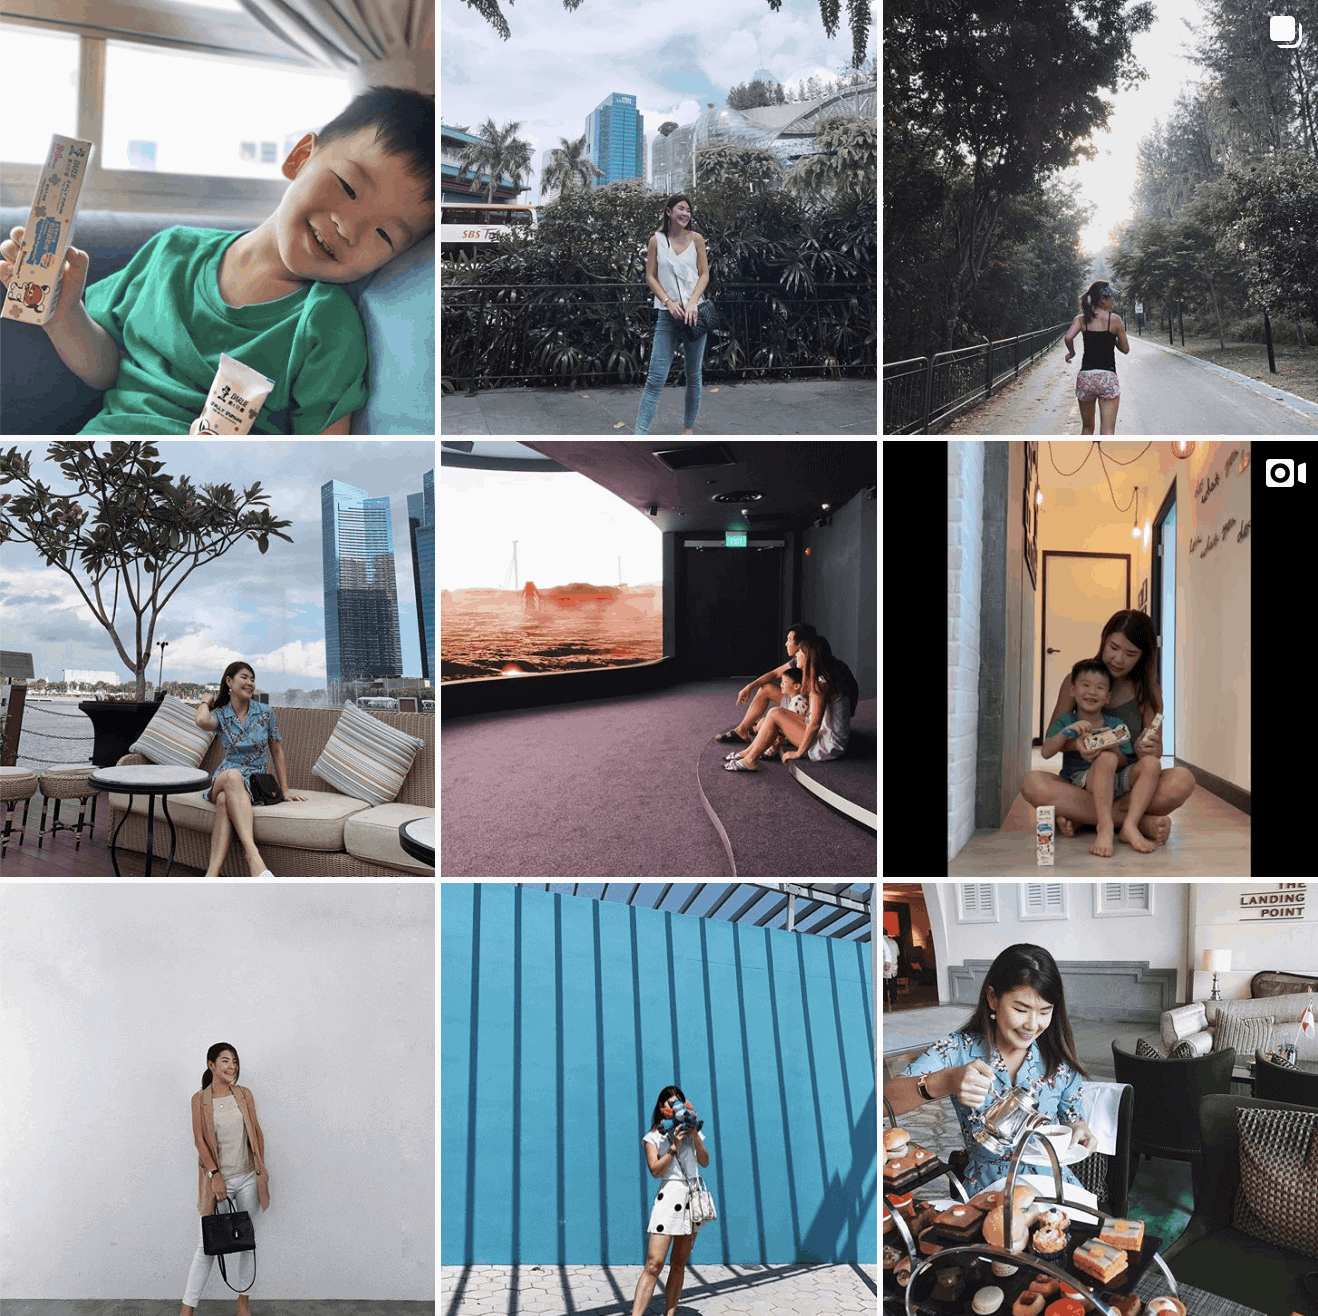 Ying Tian Instagram